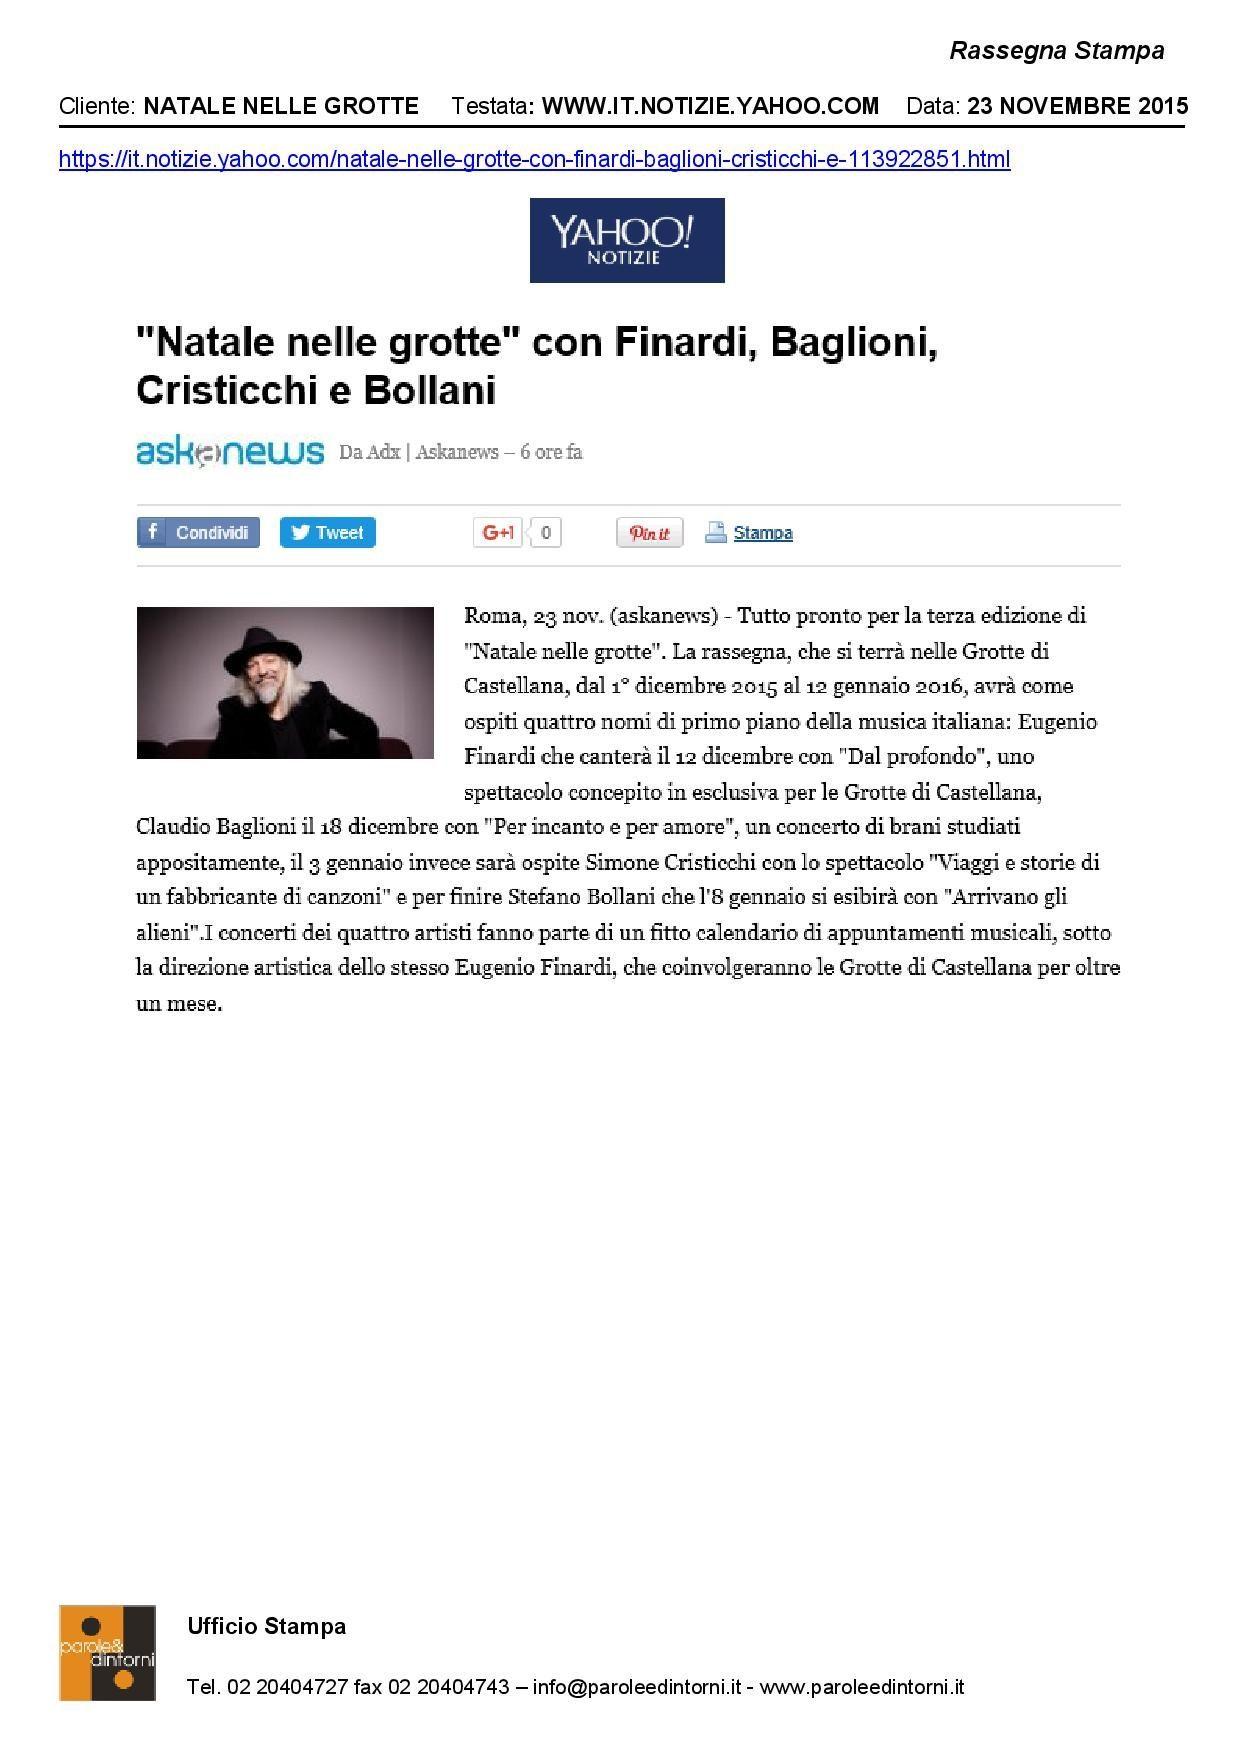 20151123_www.it.notizie.yahoo.com_Natale nelle Grotte-page-001